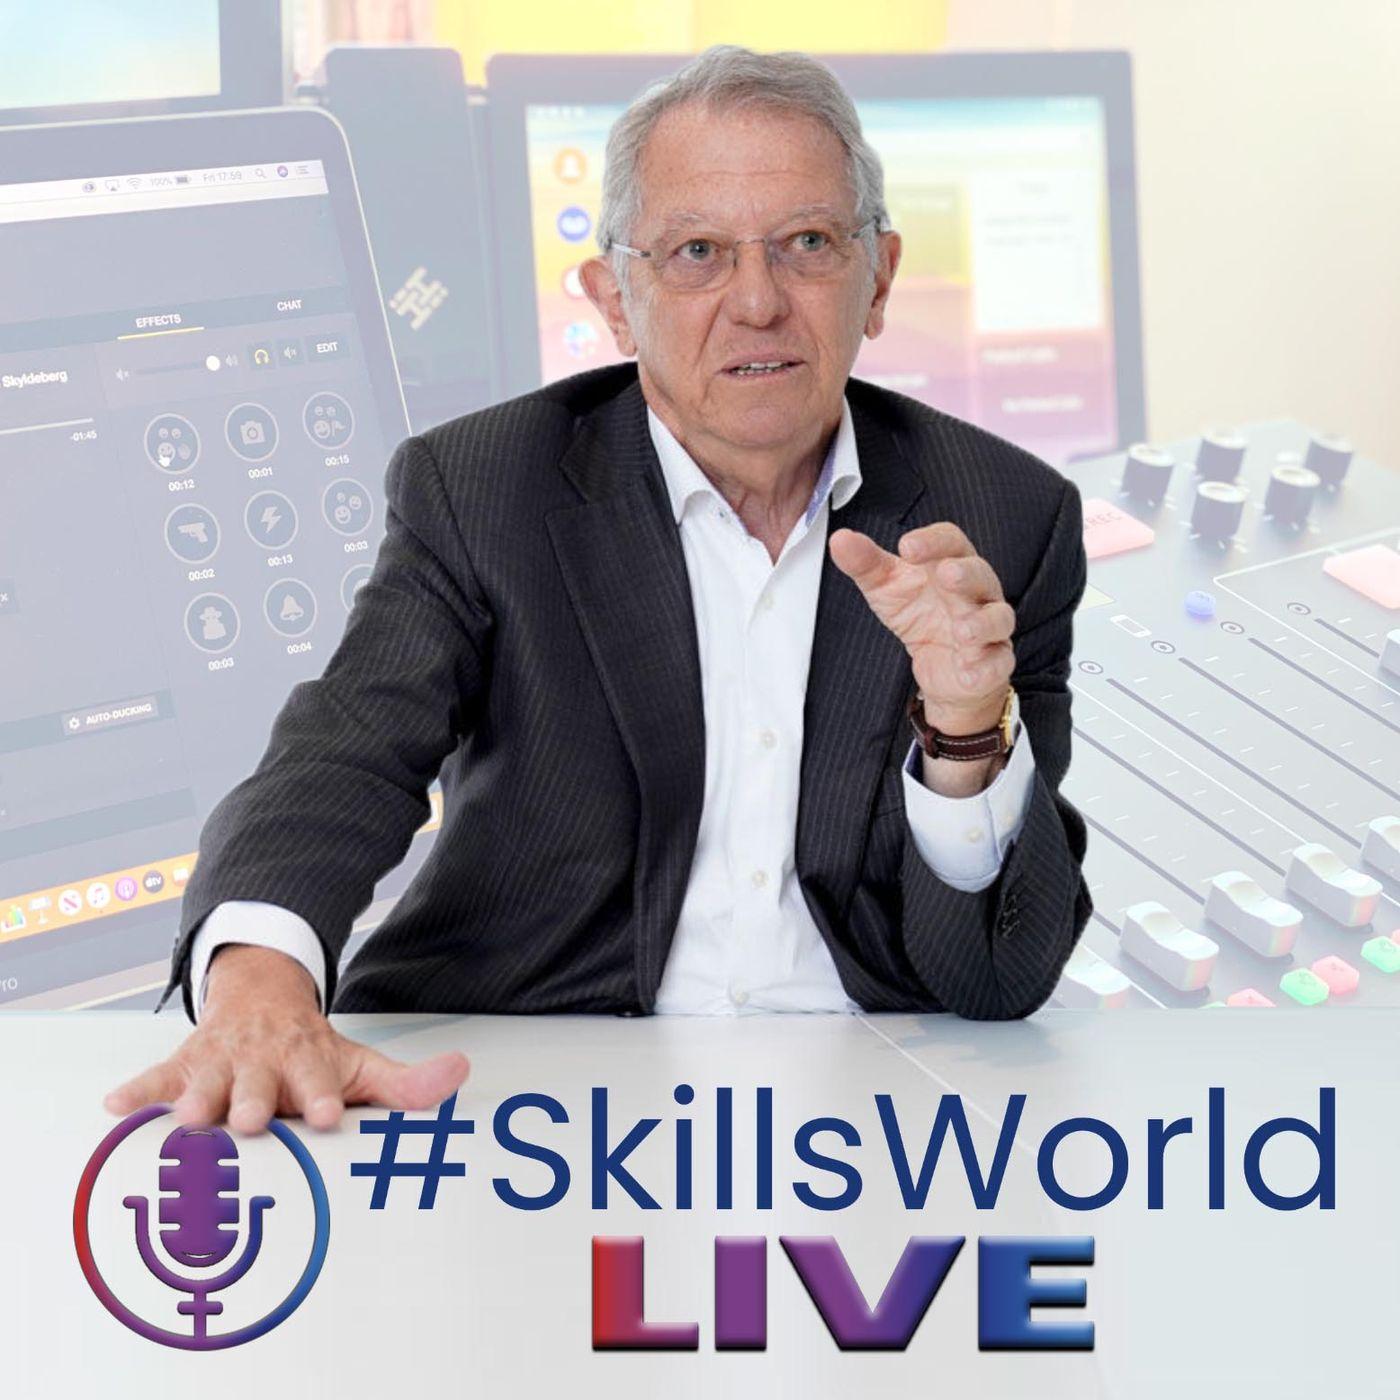 Covid Secure: Is it safe for pupils to go back to school? Episode 24: #SkillsWorldLIVE